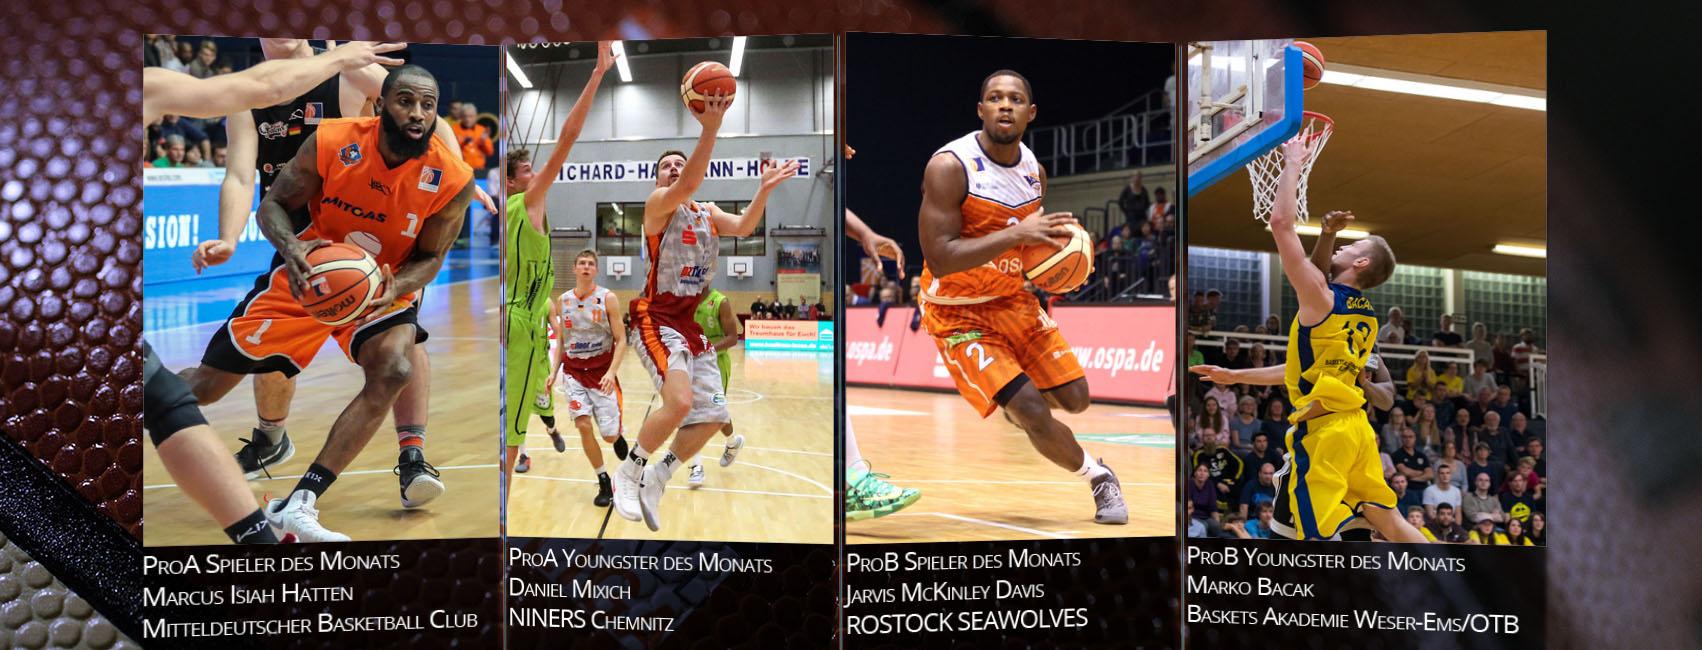 Großzügig Basketball Lebenslauf Beispiel Ideen - Entry Level Resume ...